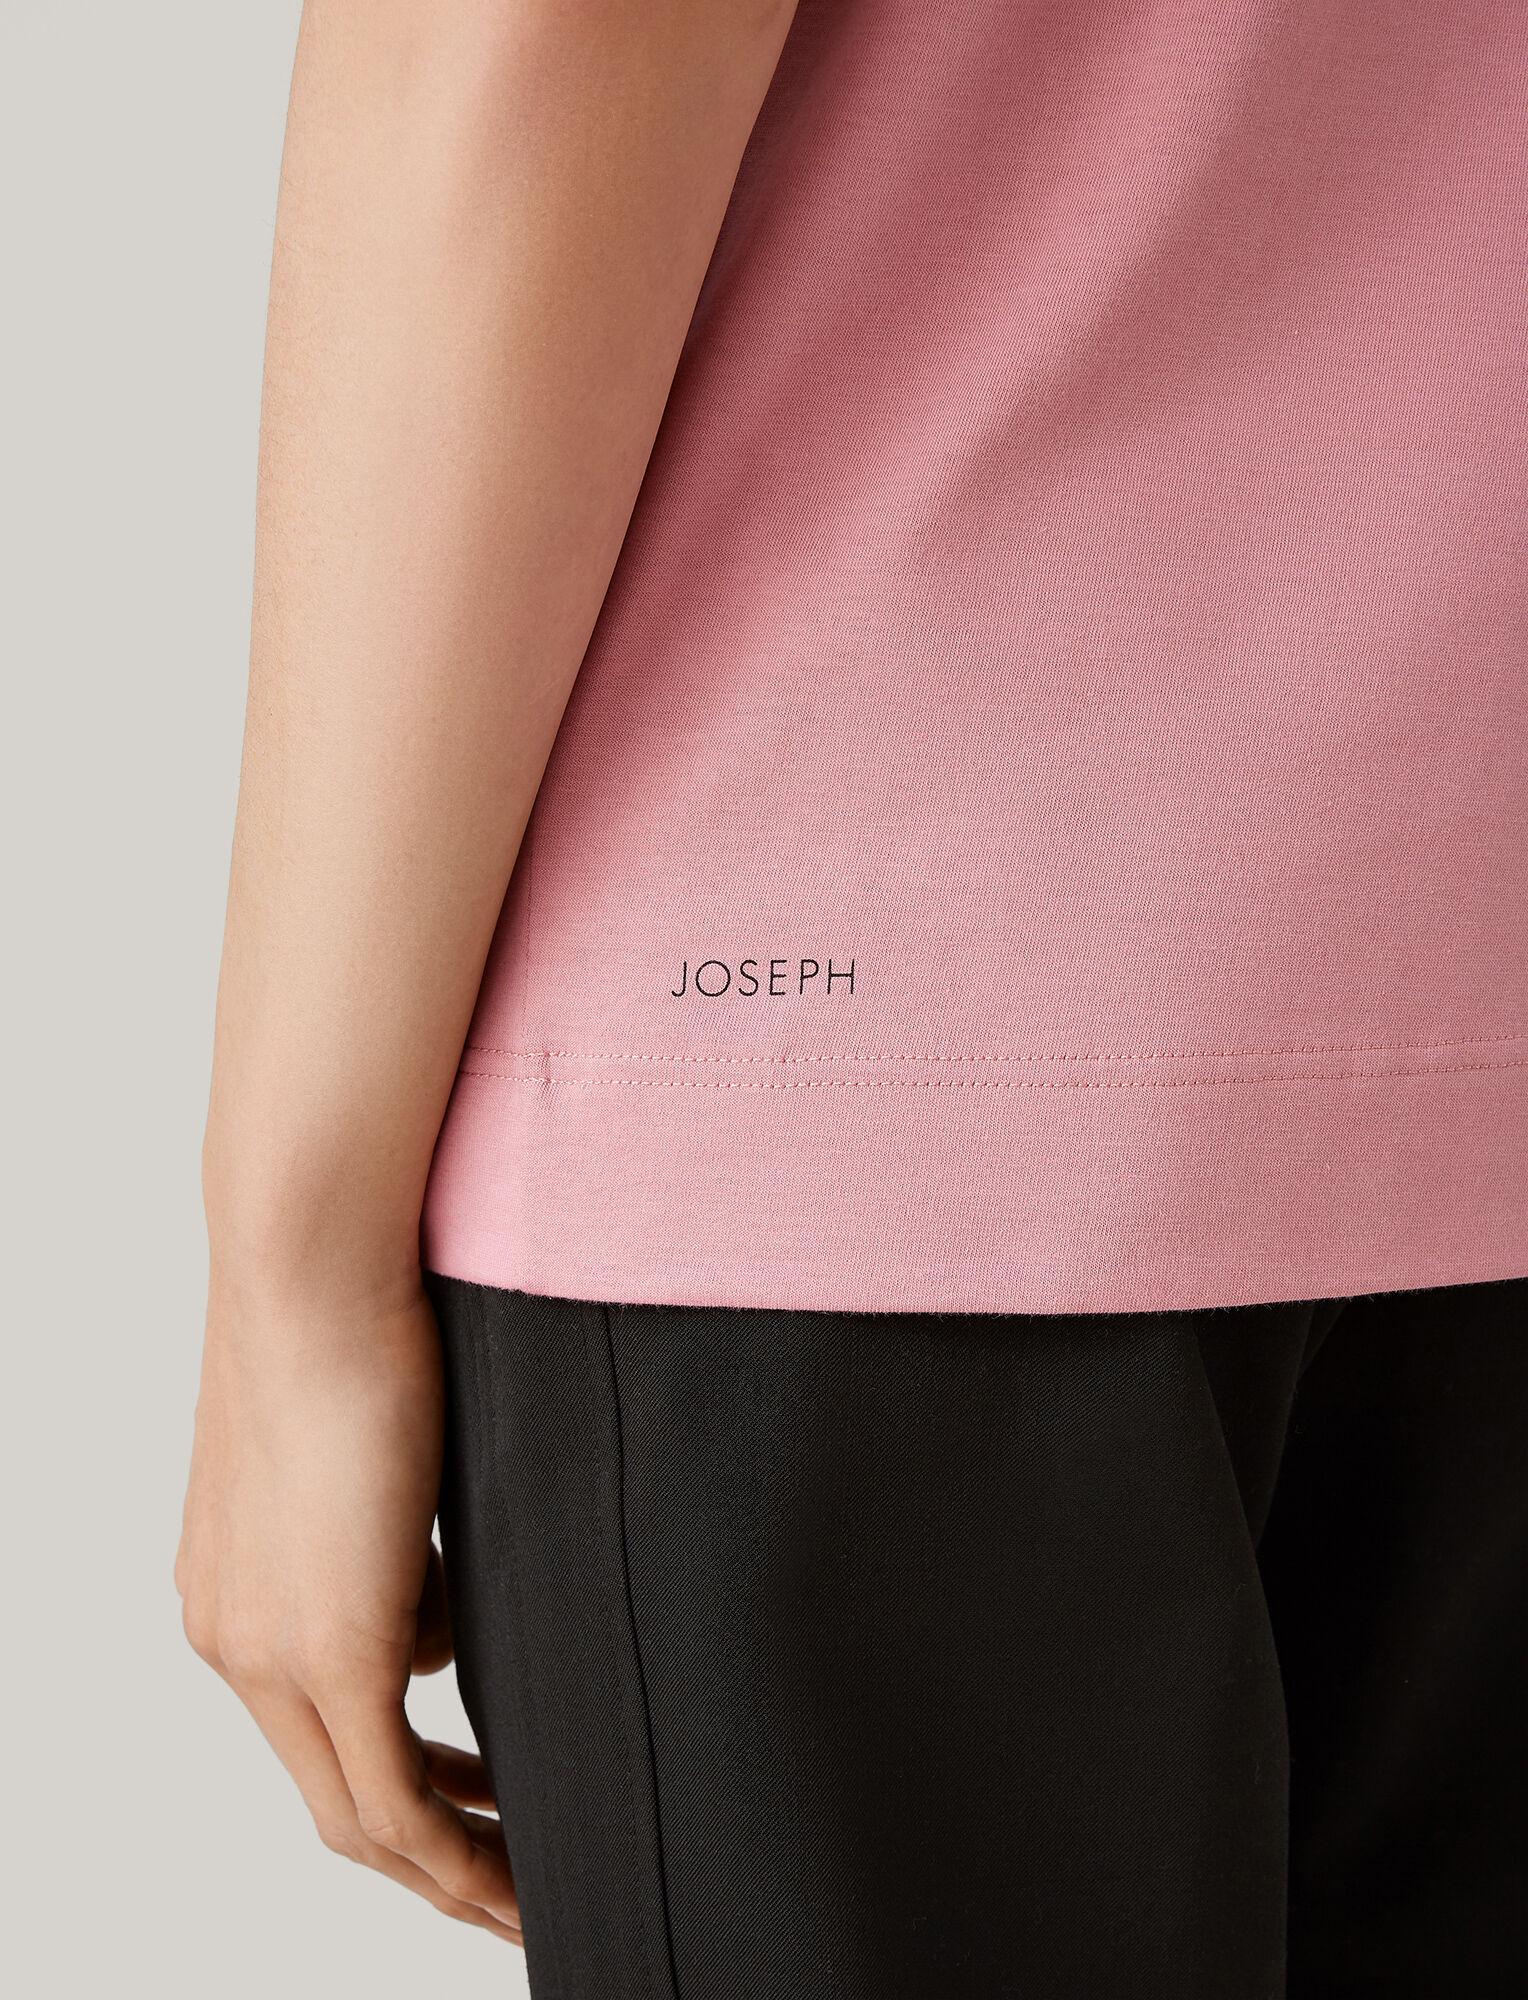 Joseph, Printed Jersey Tee, in PINK